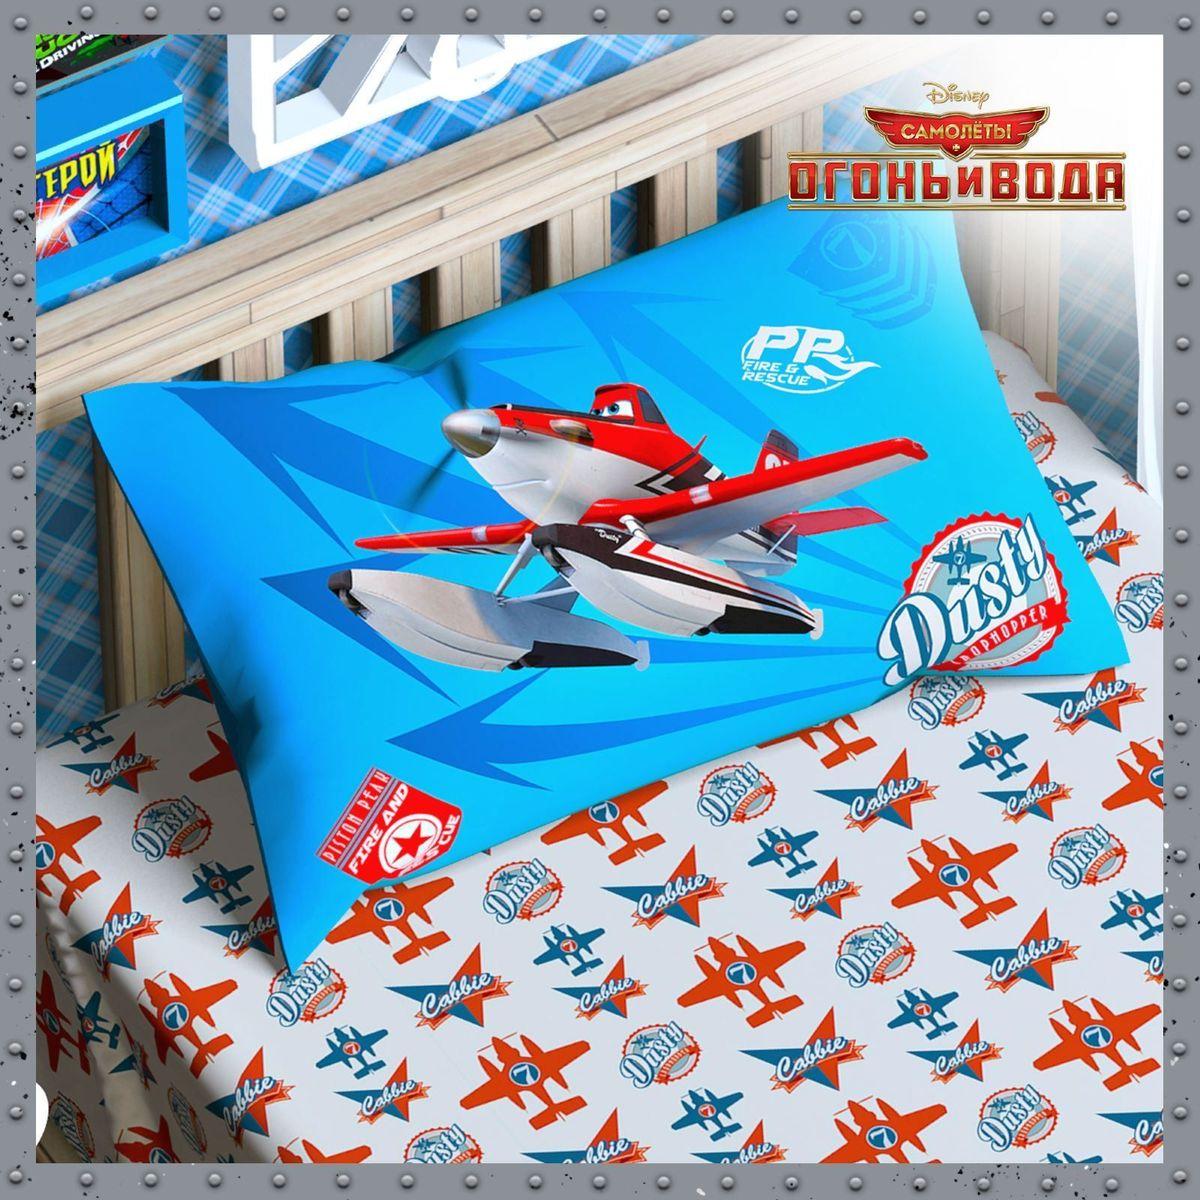 Disney Подушка панно Самолеты 50 х 70 1153116